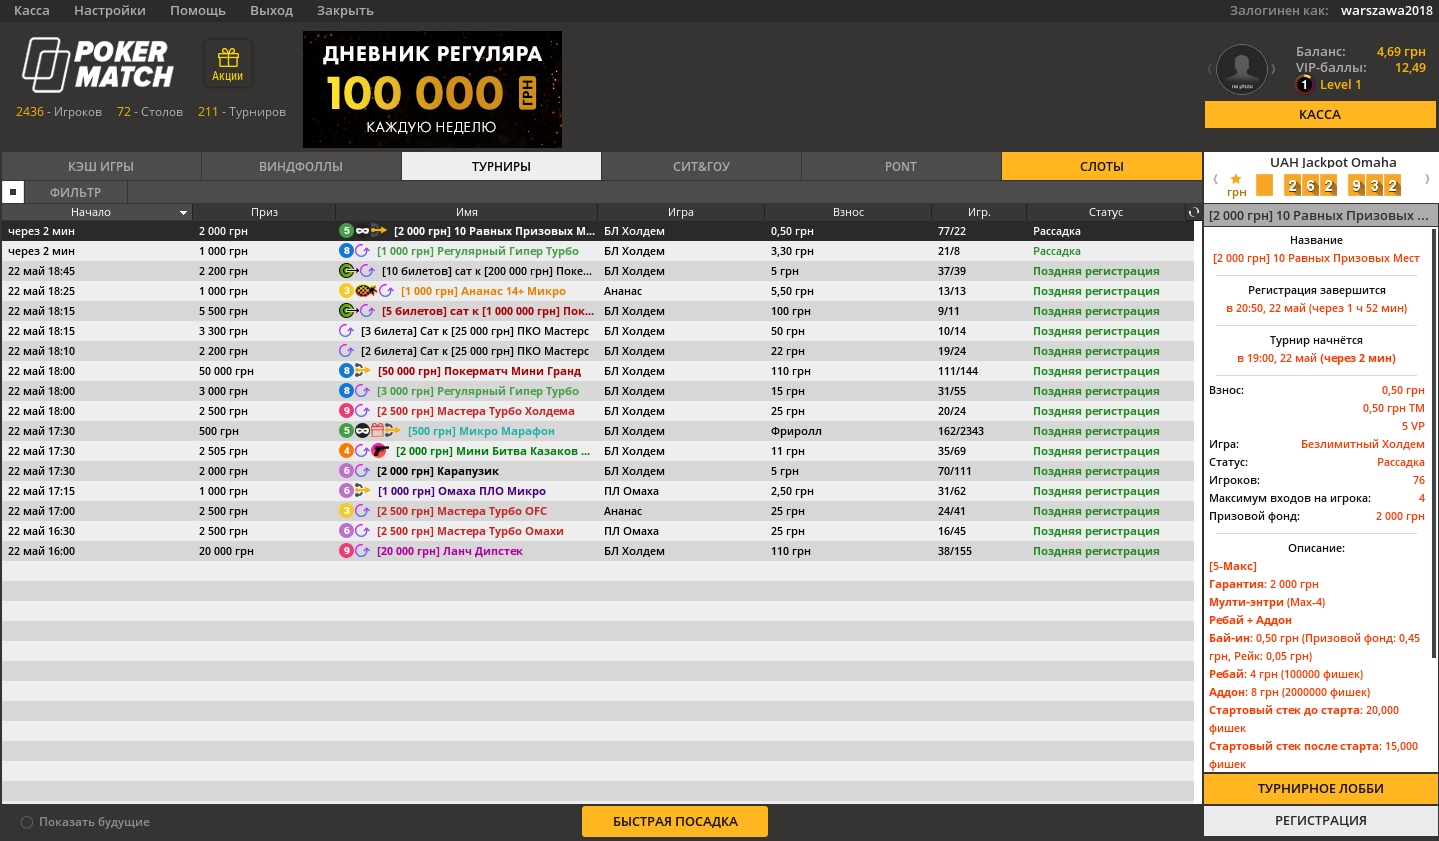 pokermatch-cleint